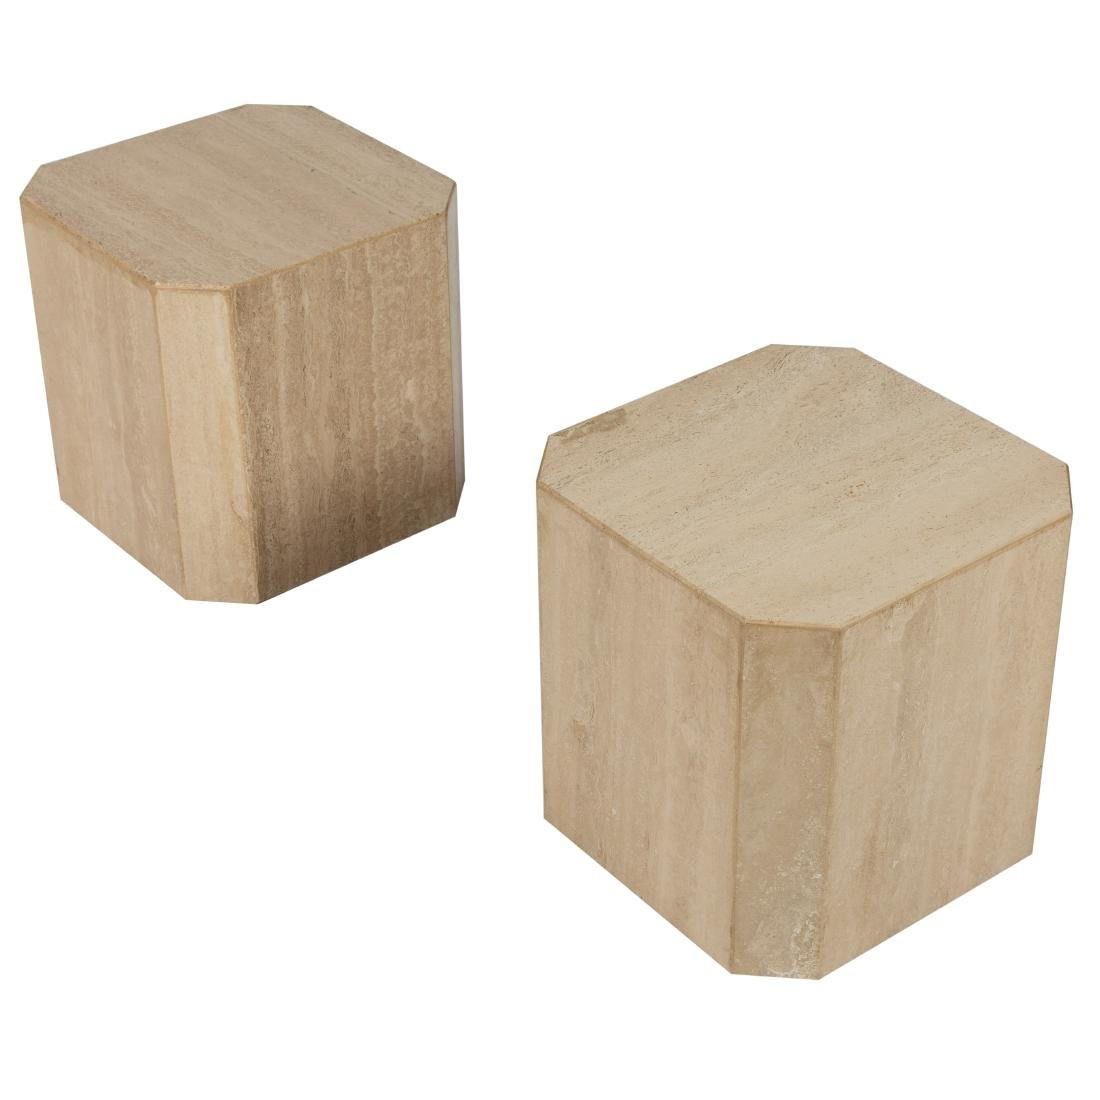 Travertine Marble Pedestal Side Tables - 2